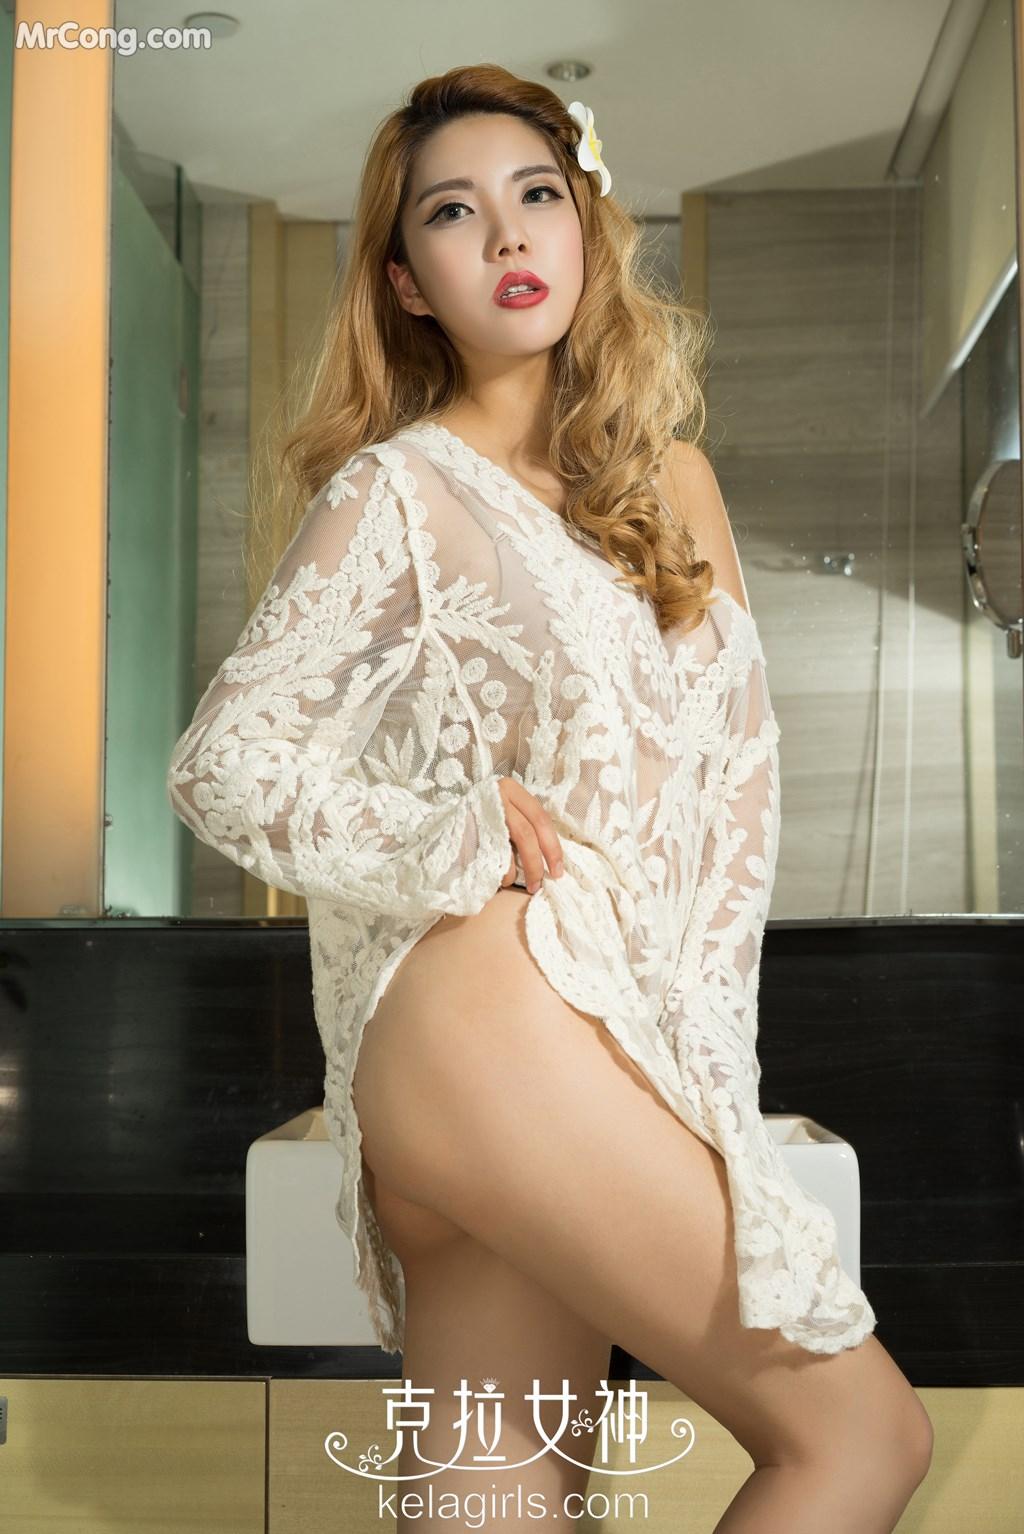 Image KelaGirls-2017-08-06-Yi-Sha-MrCong.com-009 in post KelaGirls 2017-08-06: Người mẫu Yi Sha (伊莎) (25 ảnh)